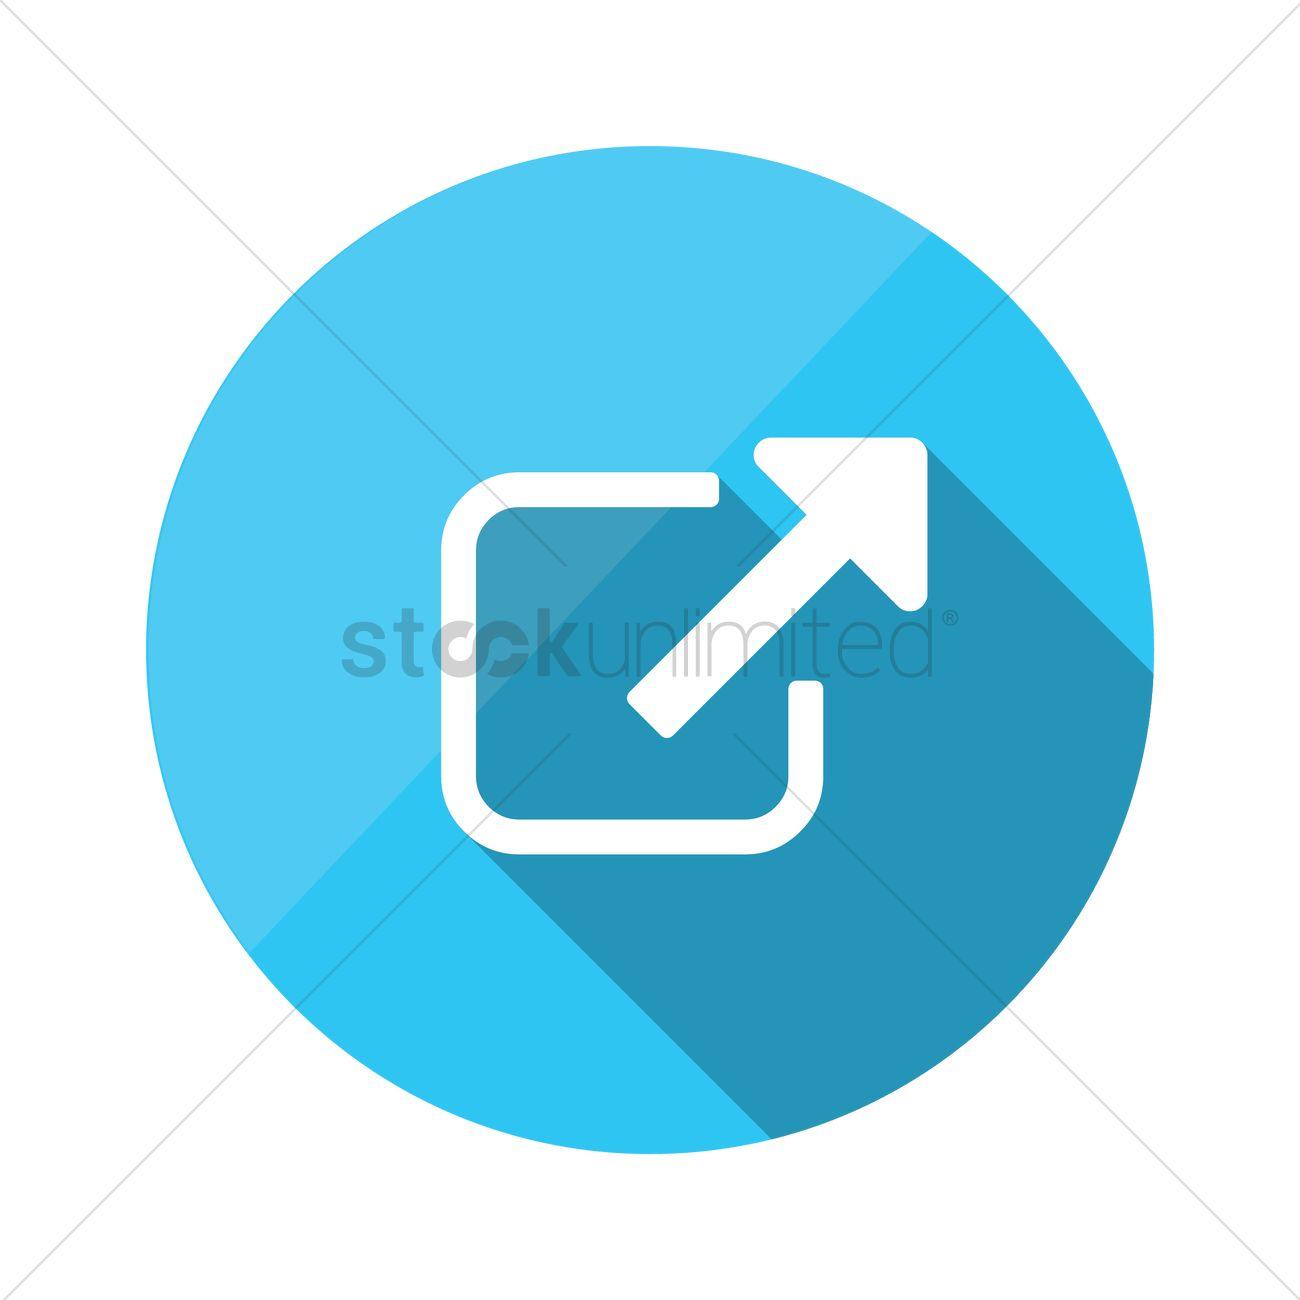 External link url icon Vector Image.